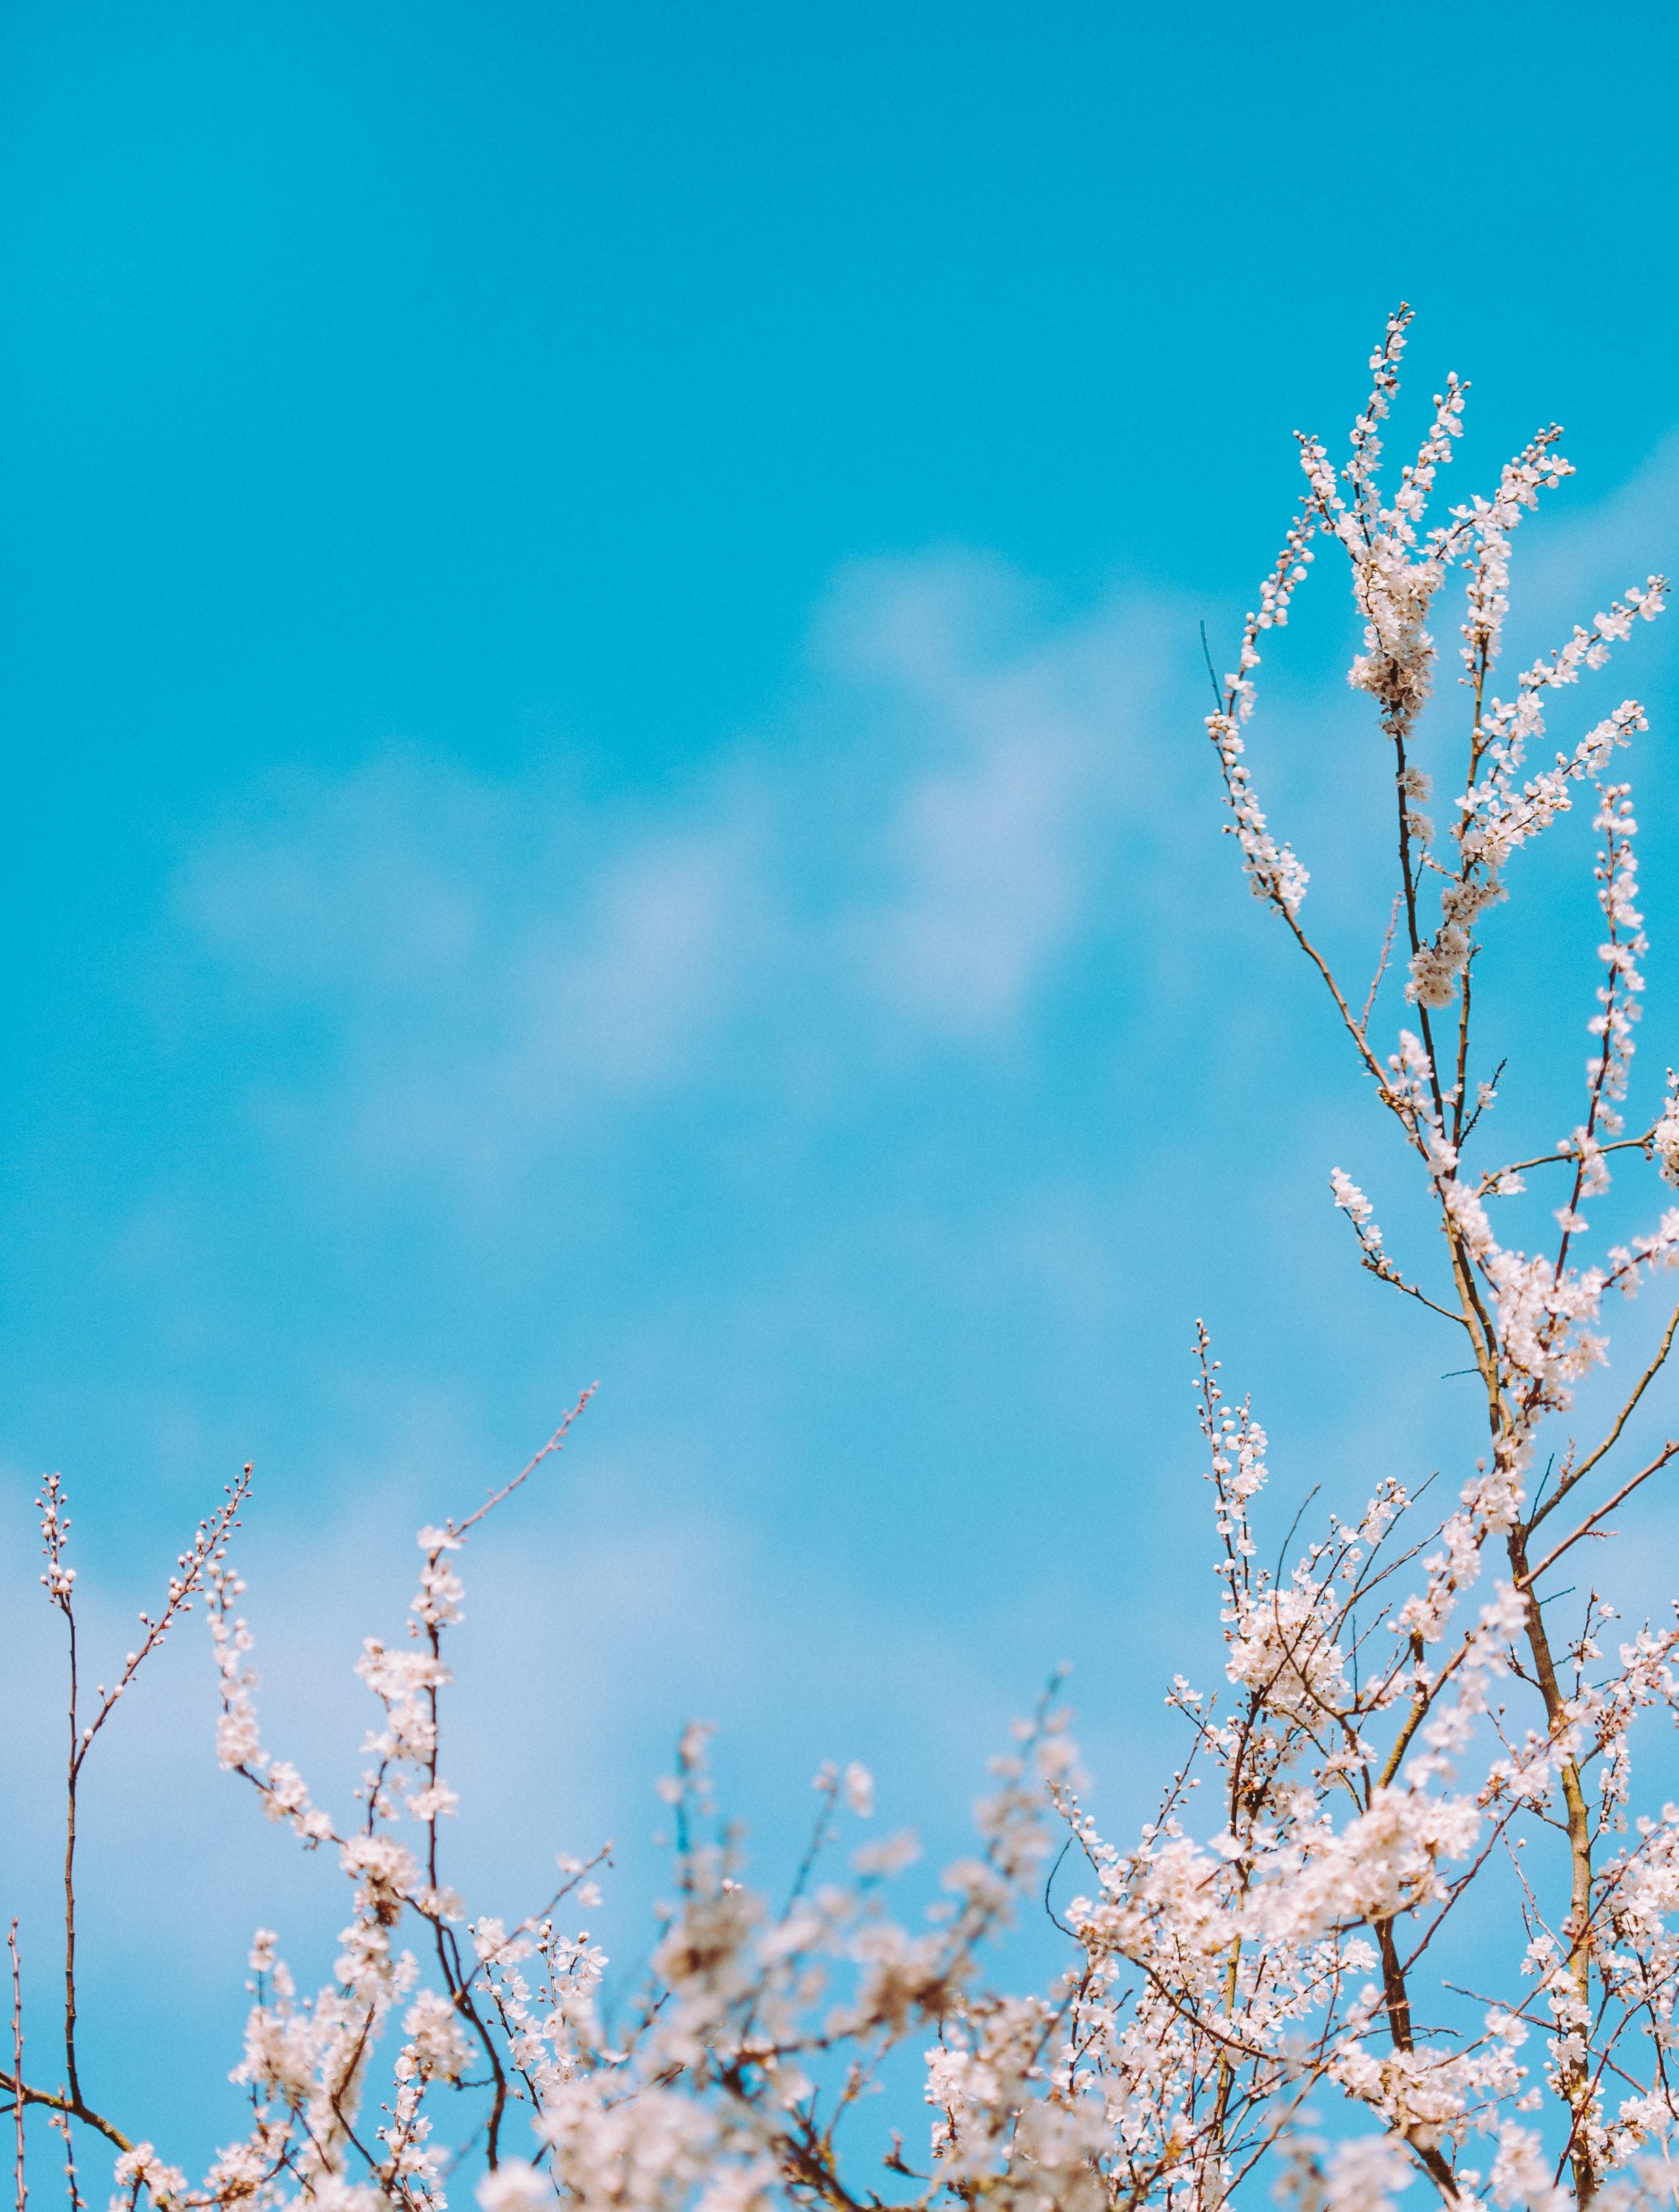 blue photography iPhone 12 wallpaper annie-spratt